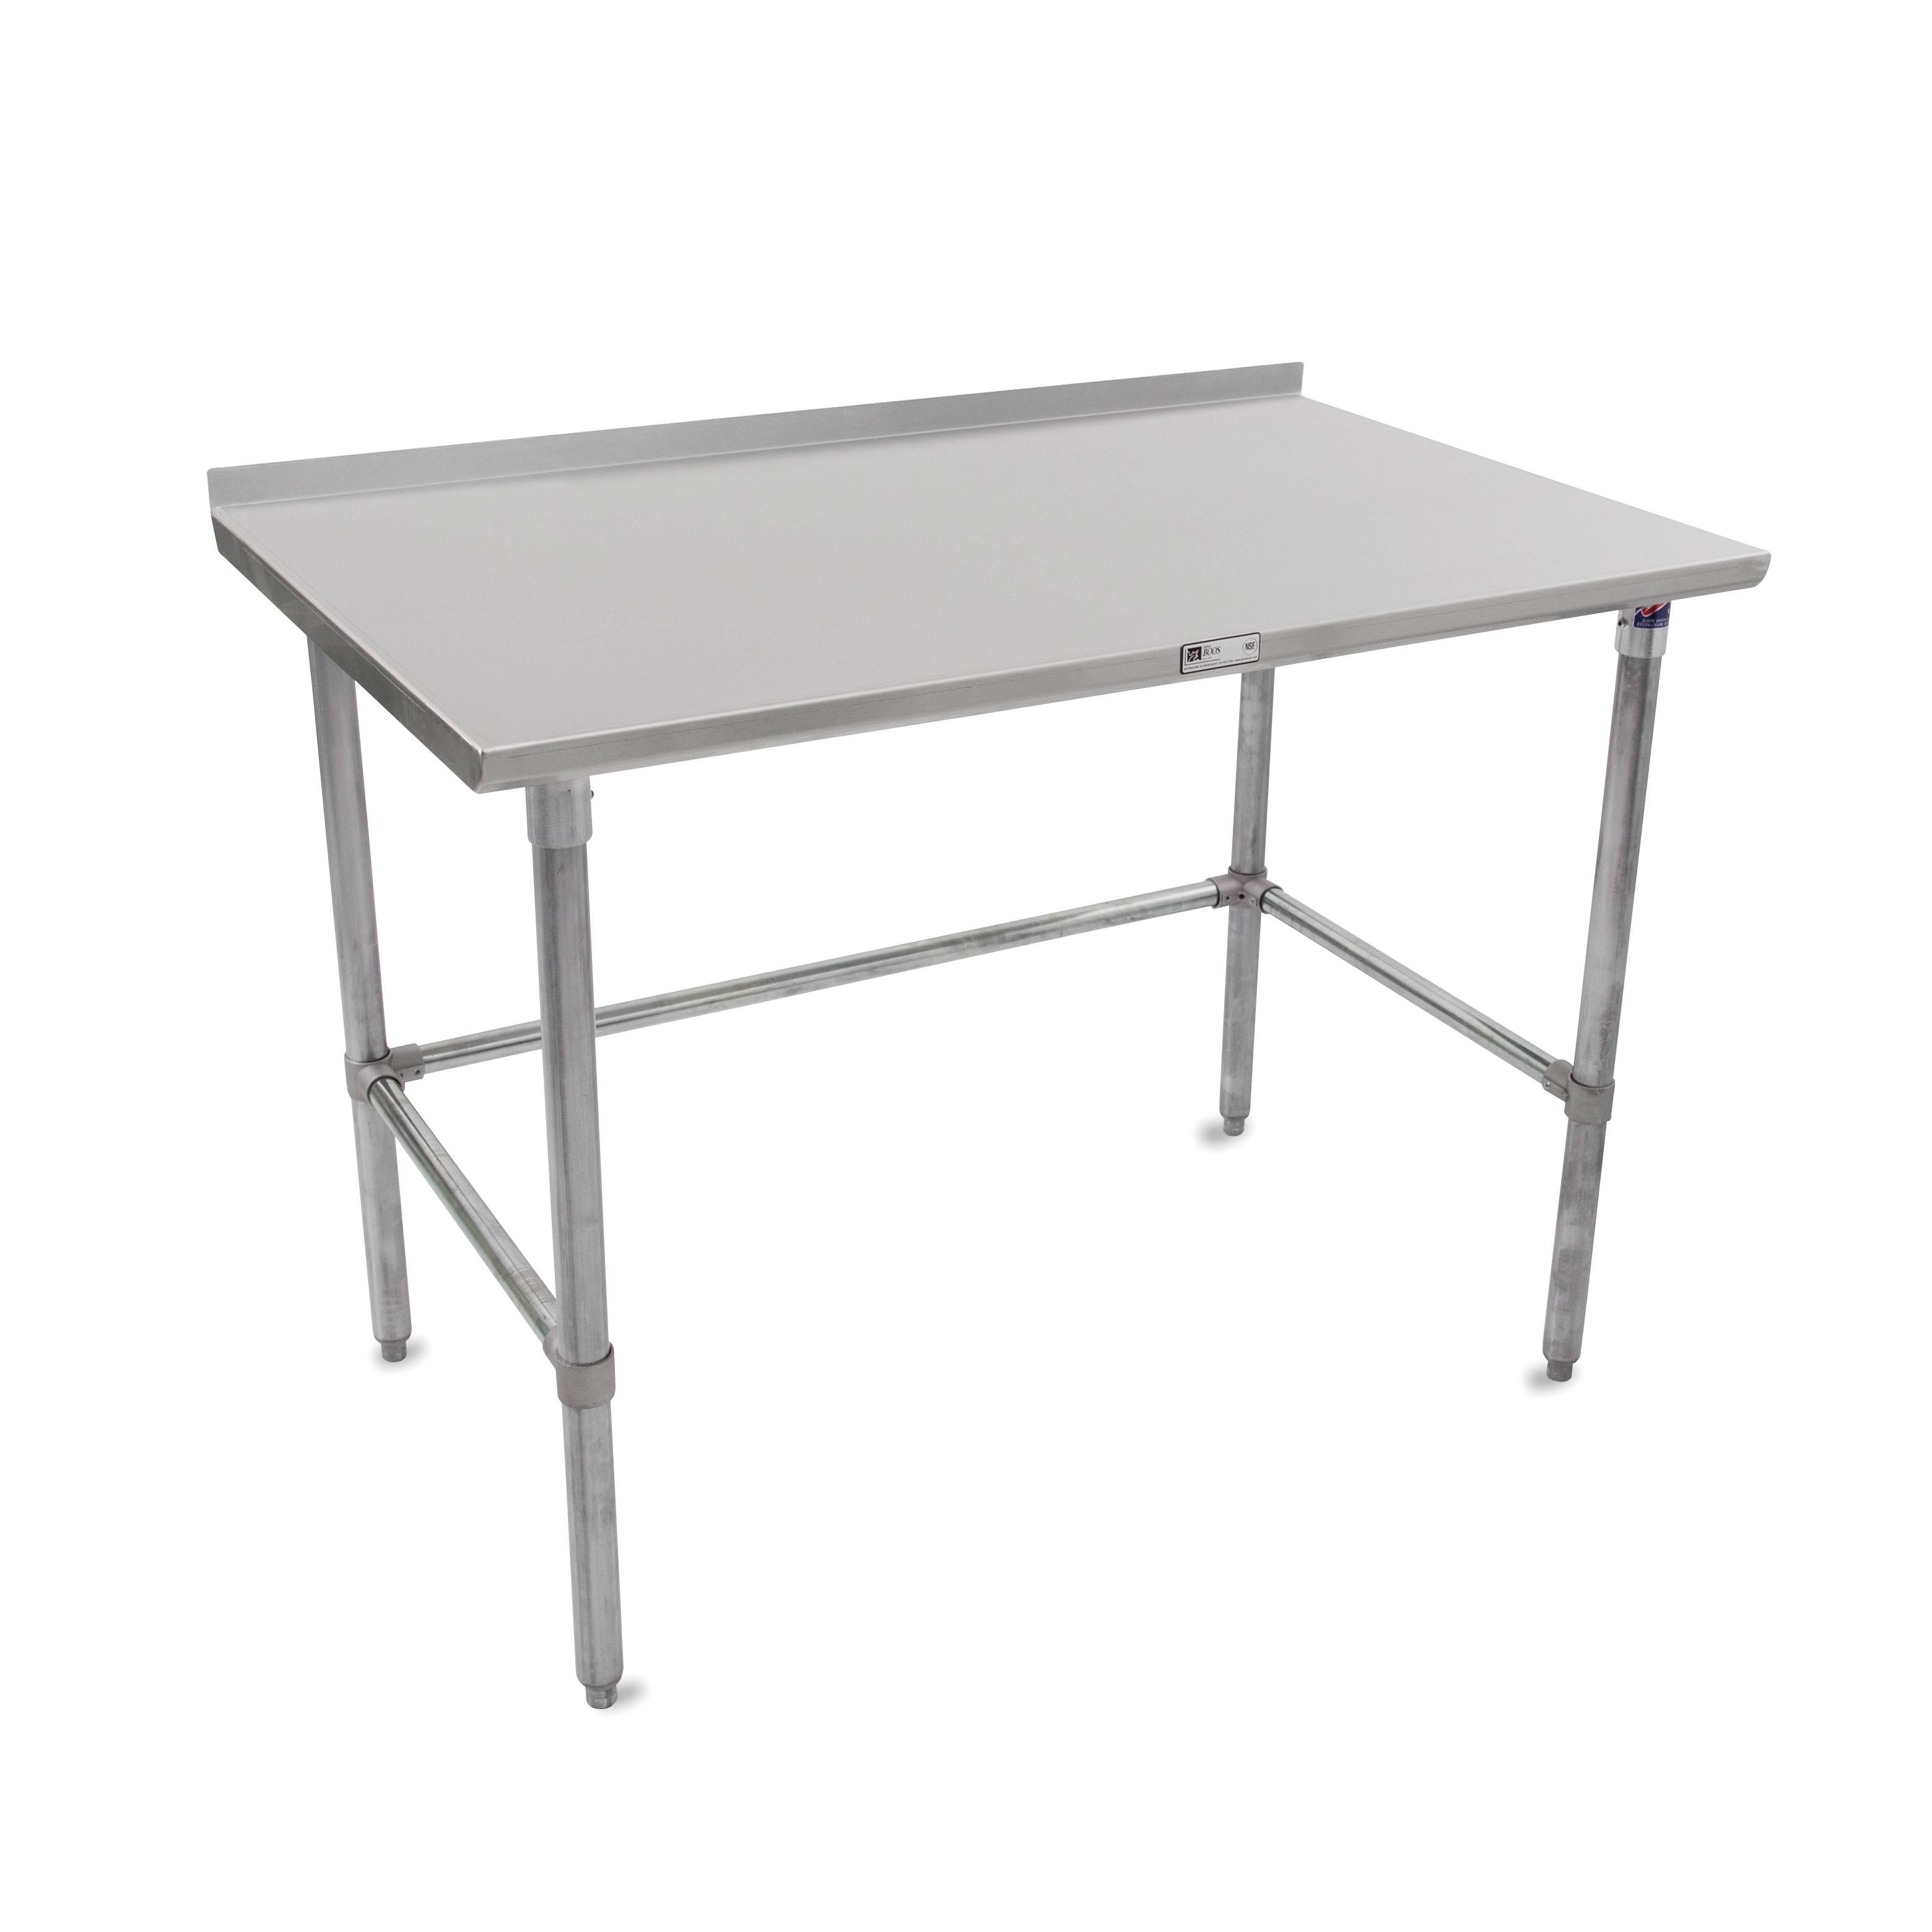 John Boos ST6R1.5-3648GBK work table,  40